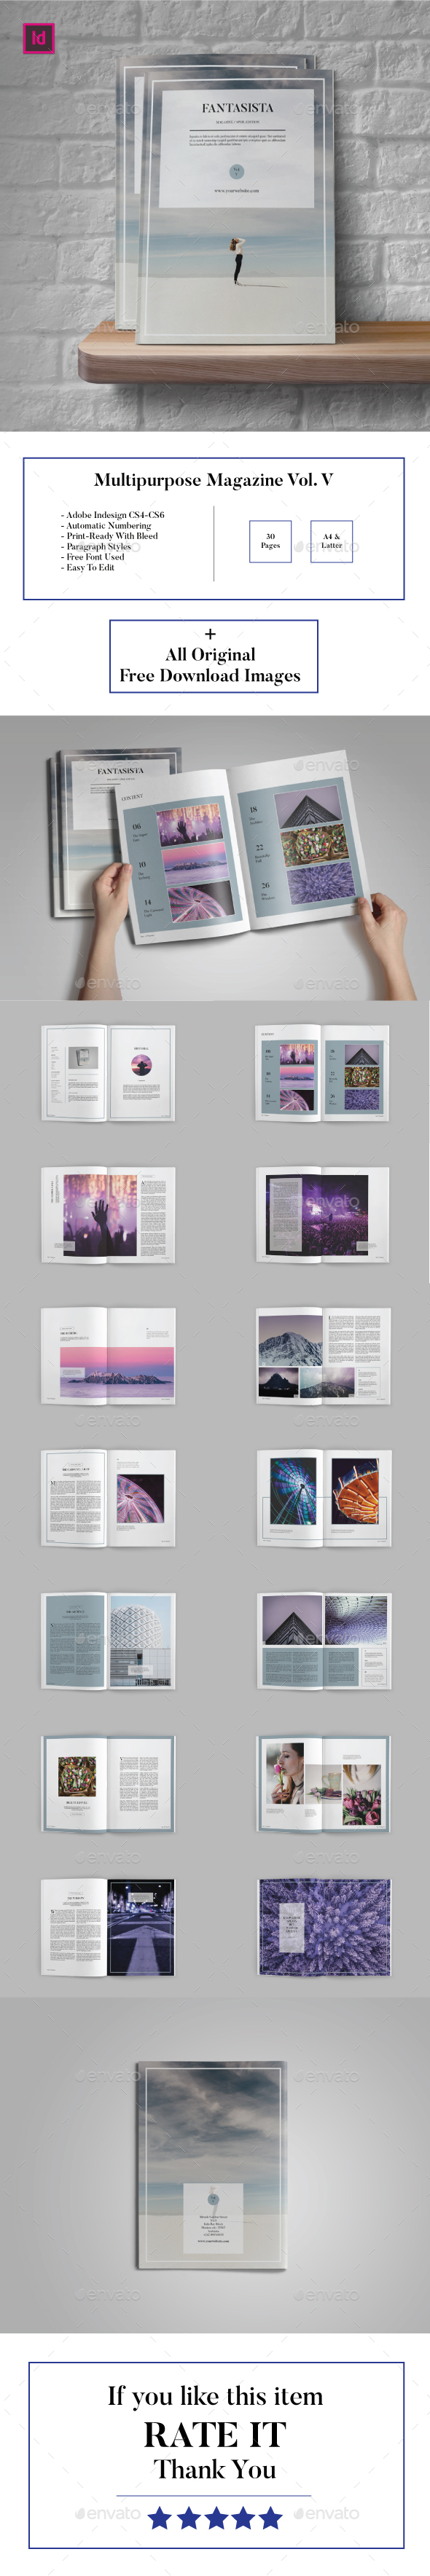 Multipurose Magazine Vol. V (Fantasista) - Magazines Print Templates